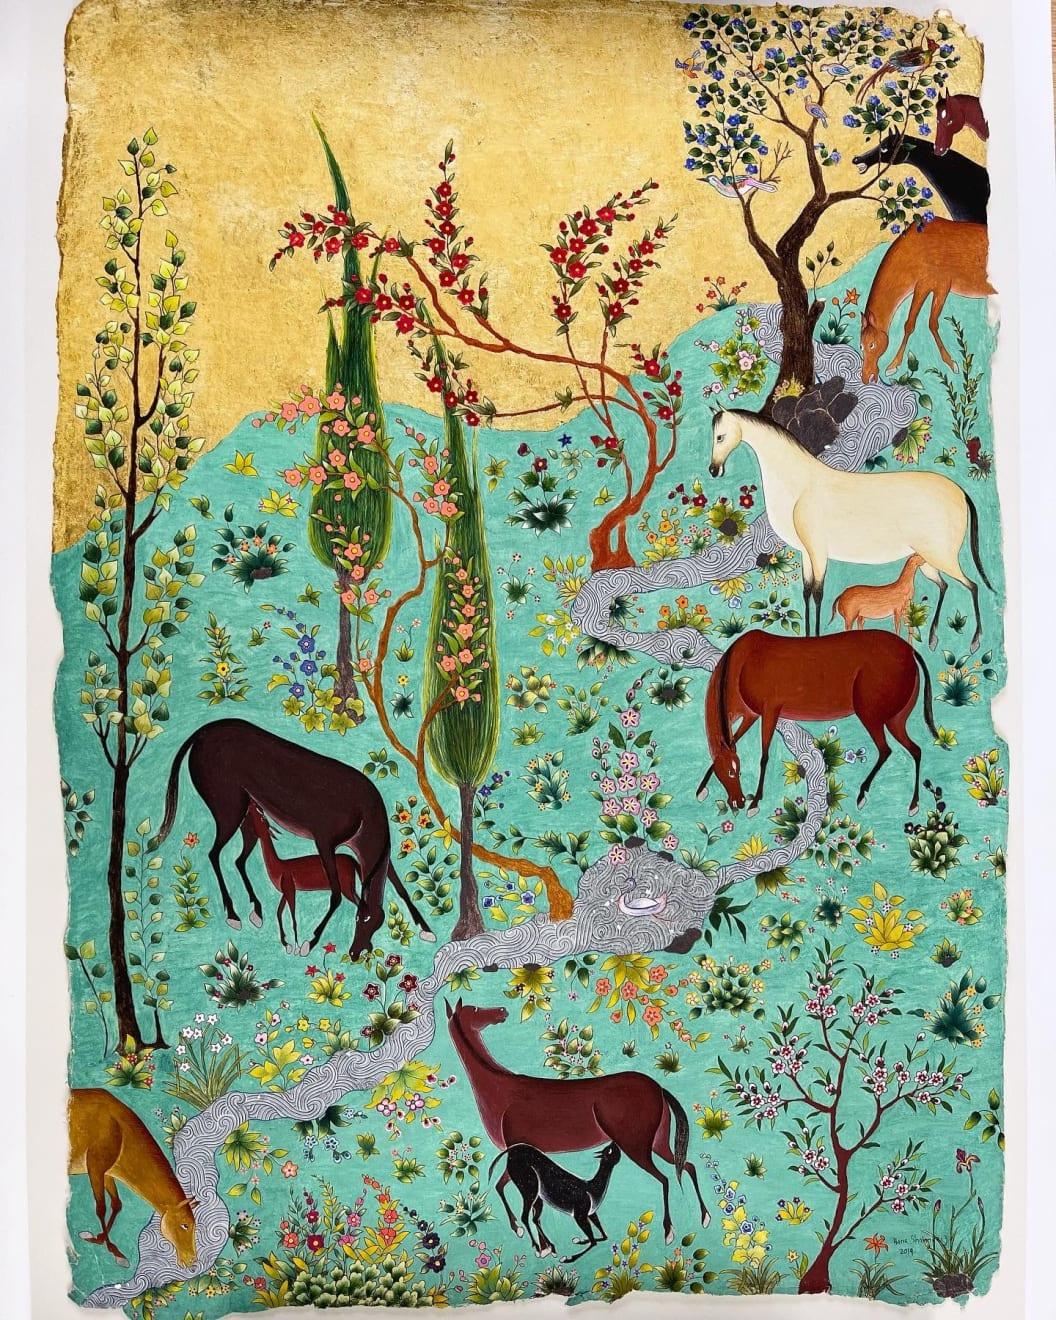 Hana Shahnavaz, A Meadow for Shabiz , 2020